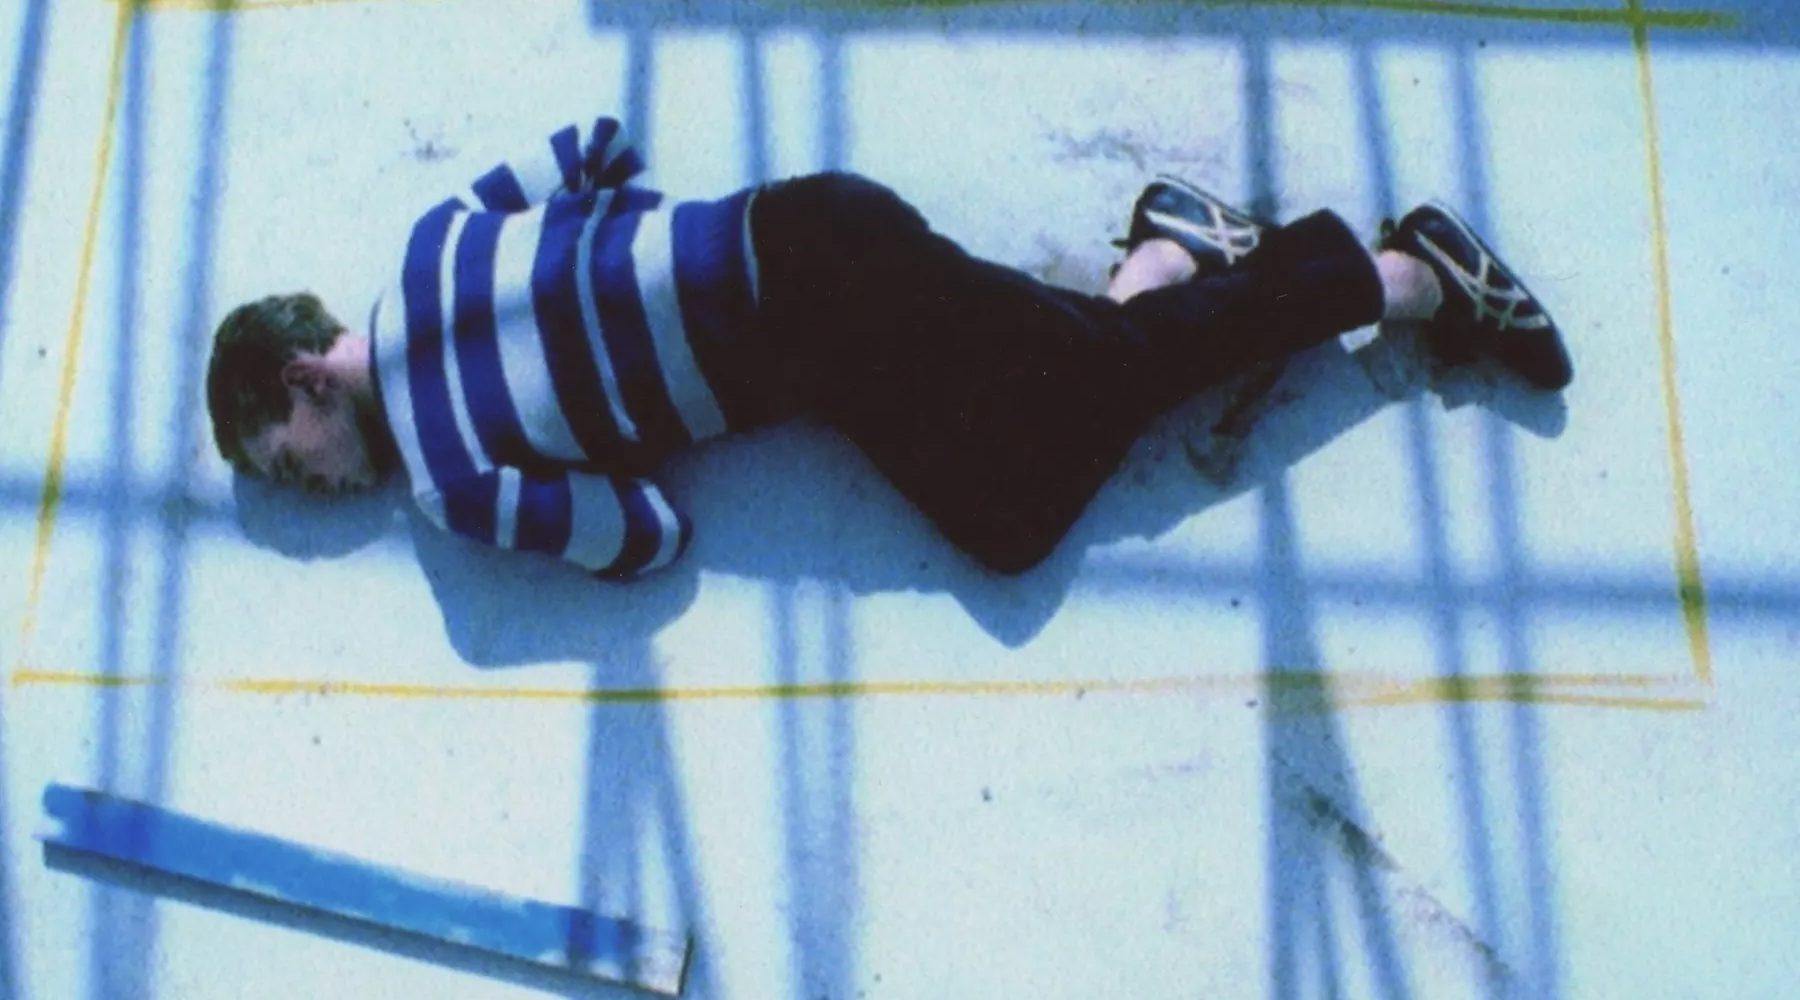 Still from Blue Tongue. 2004. Justin Kurzel.